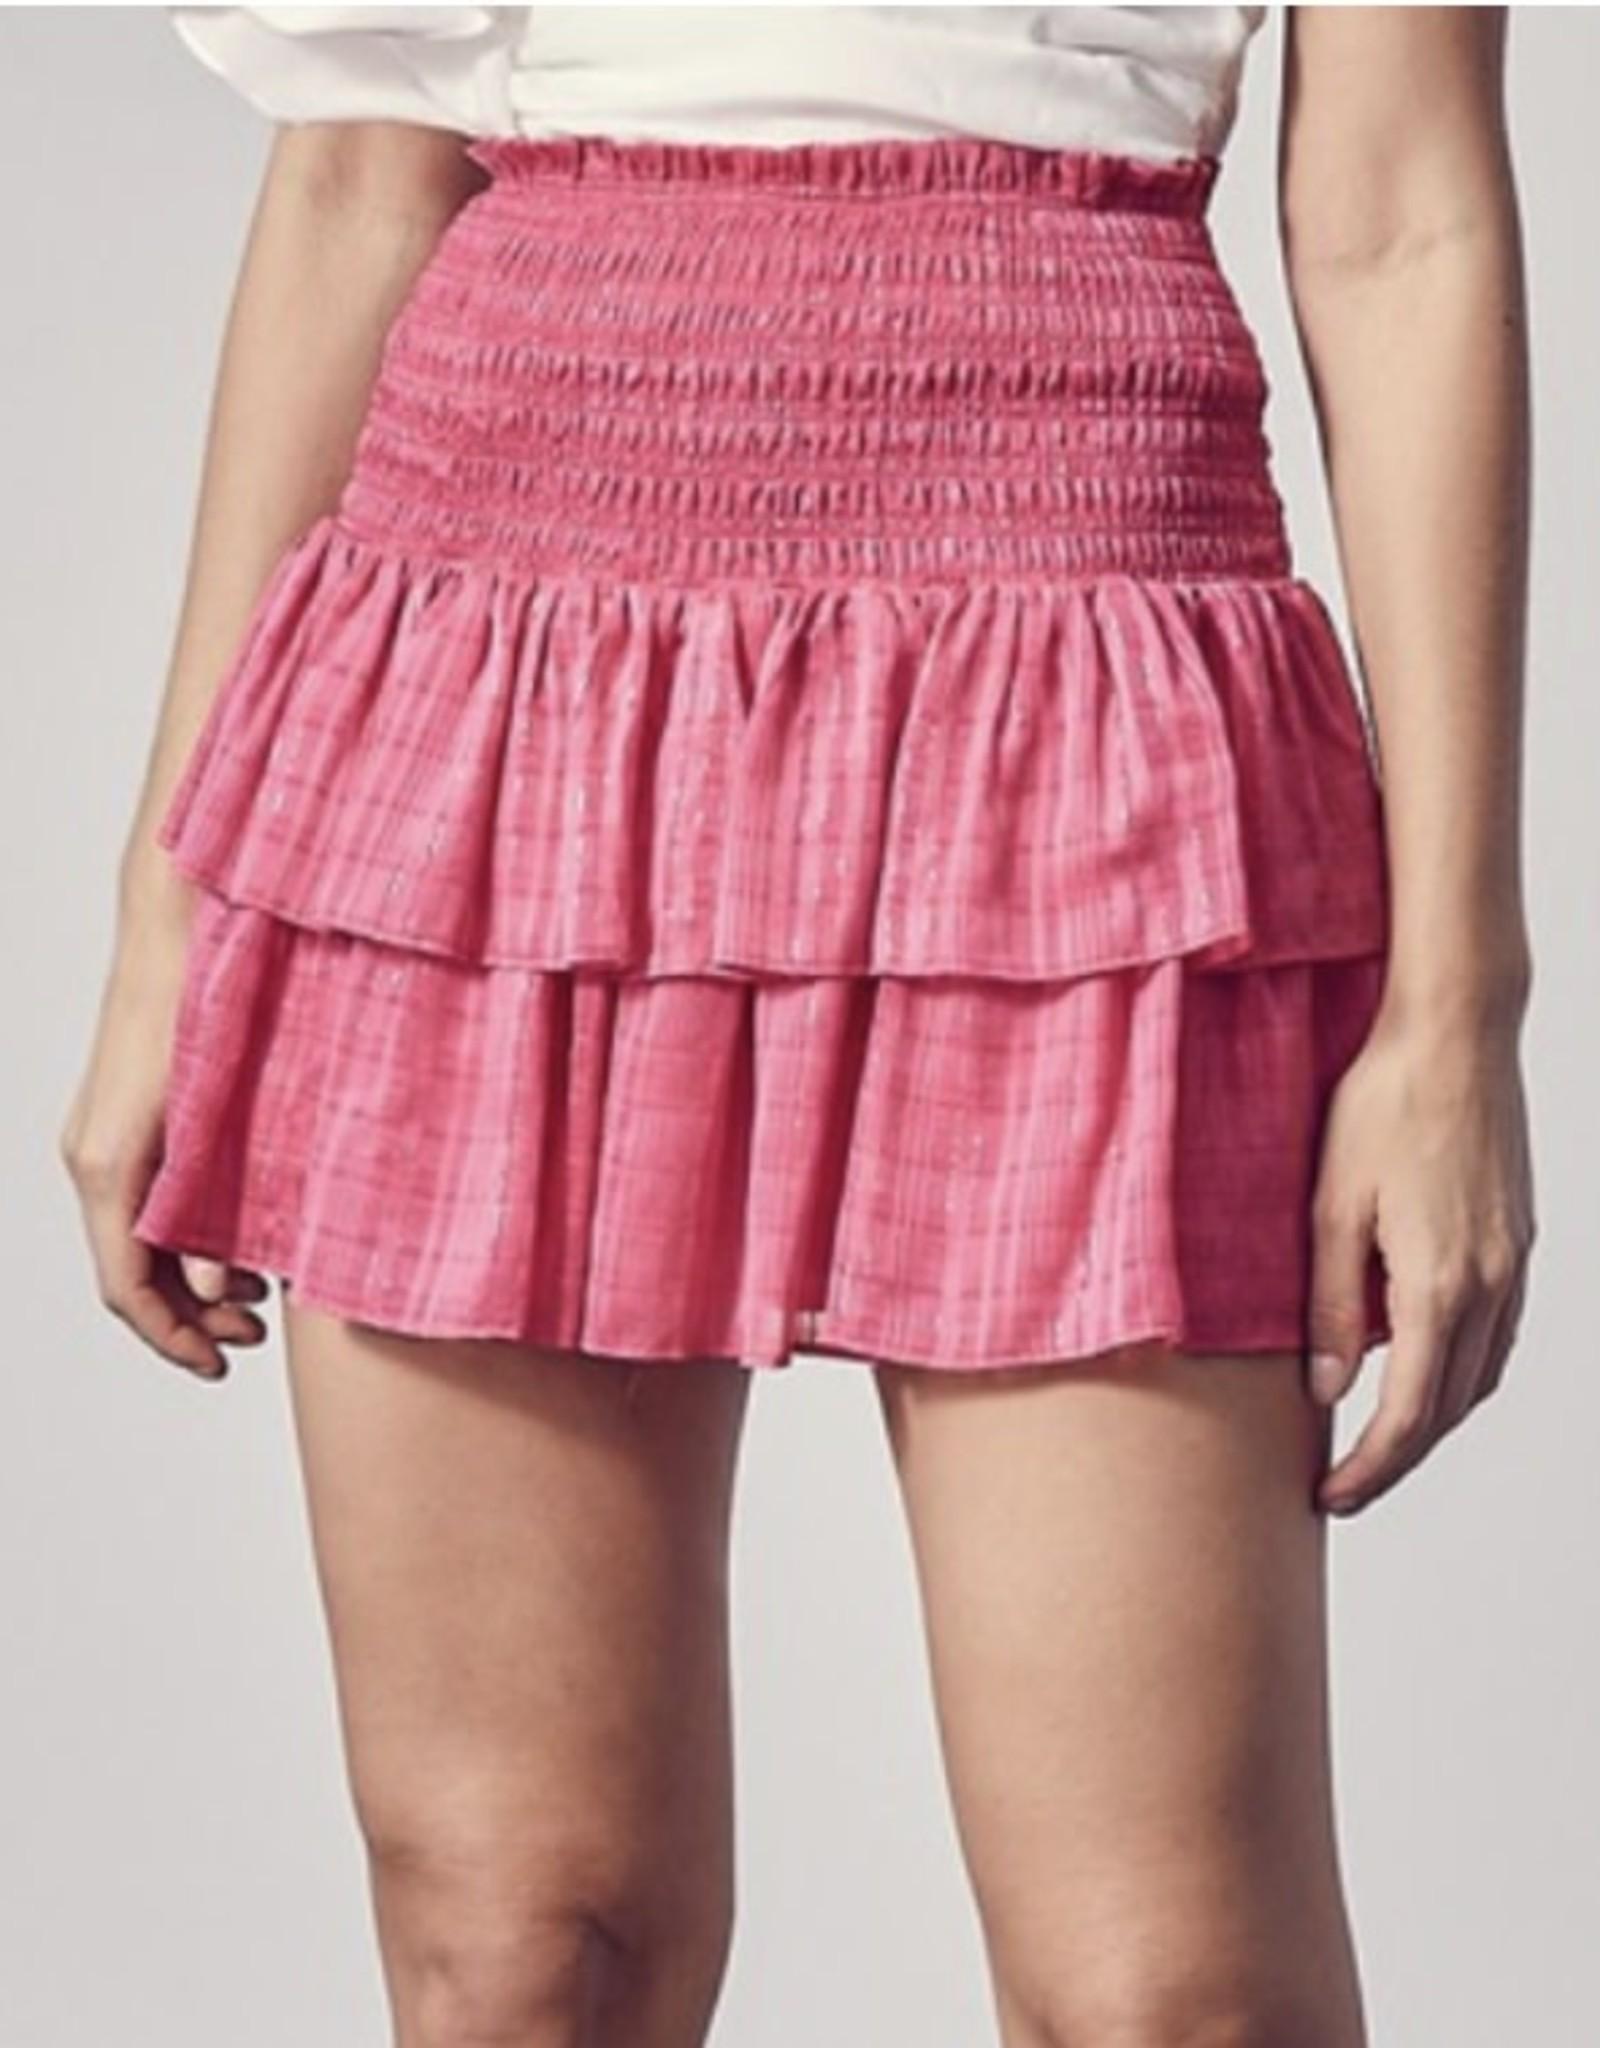 Elle Pink Ruffle Skirt